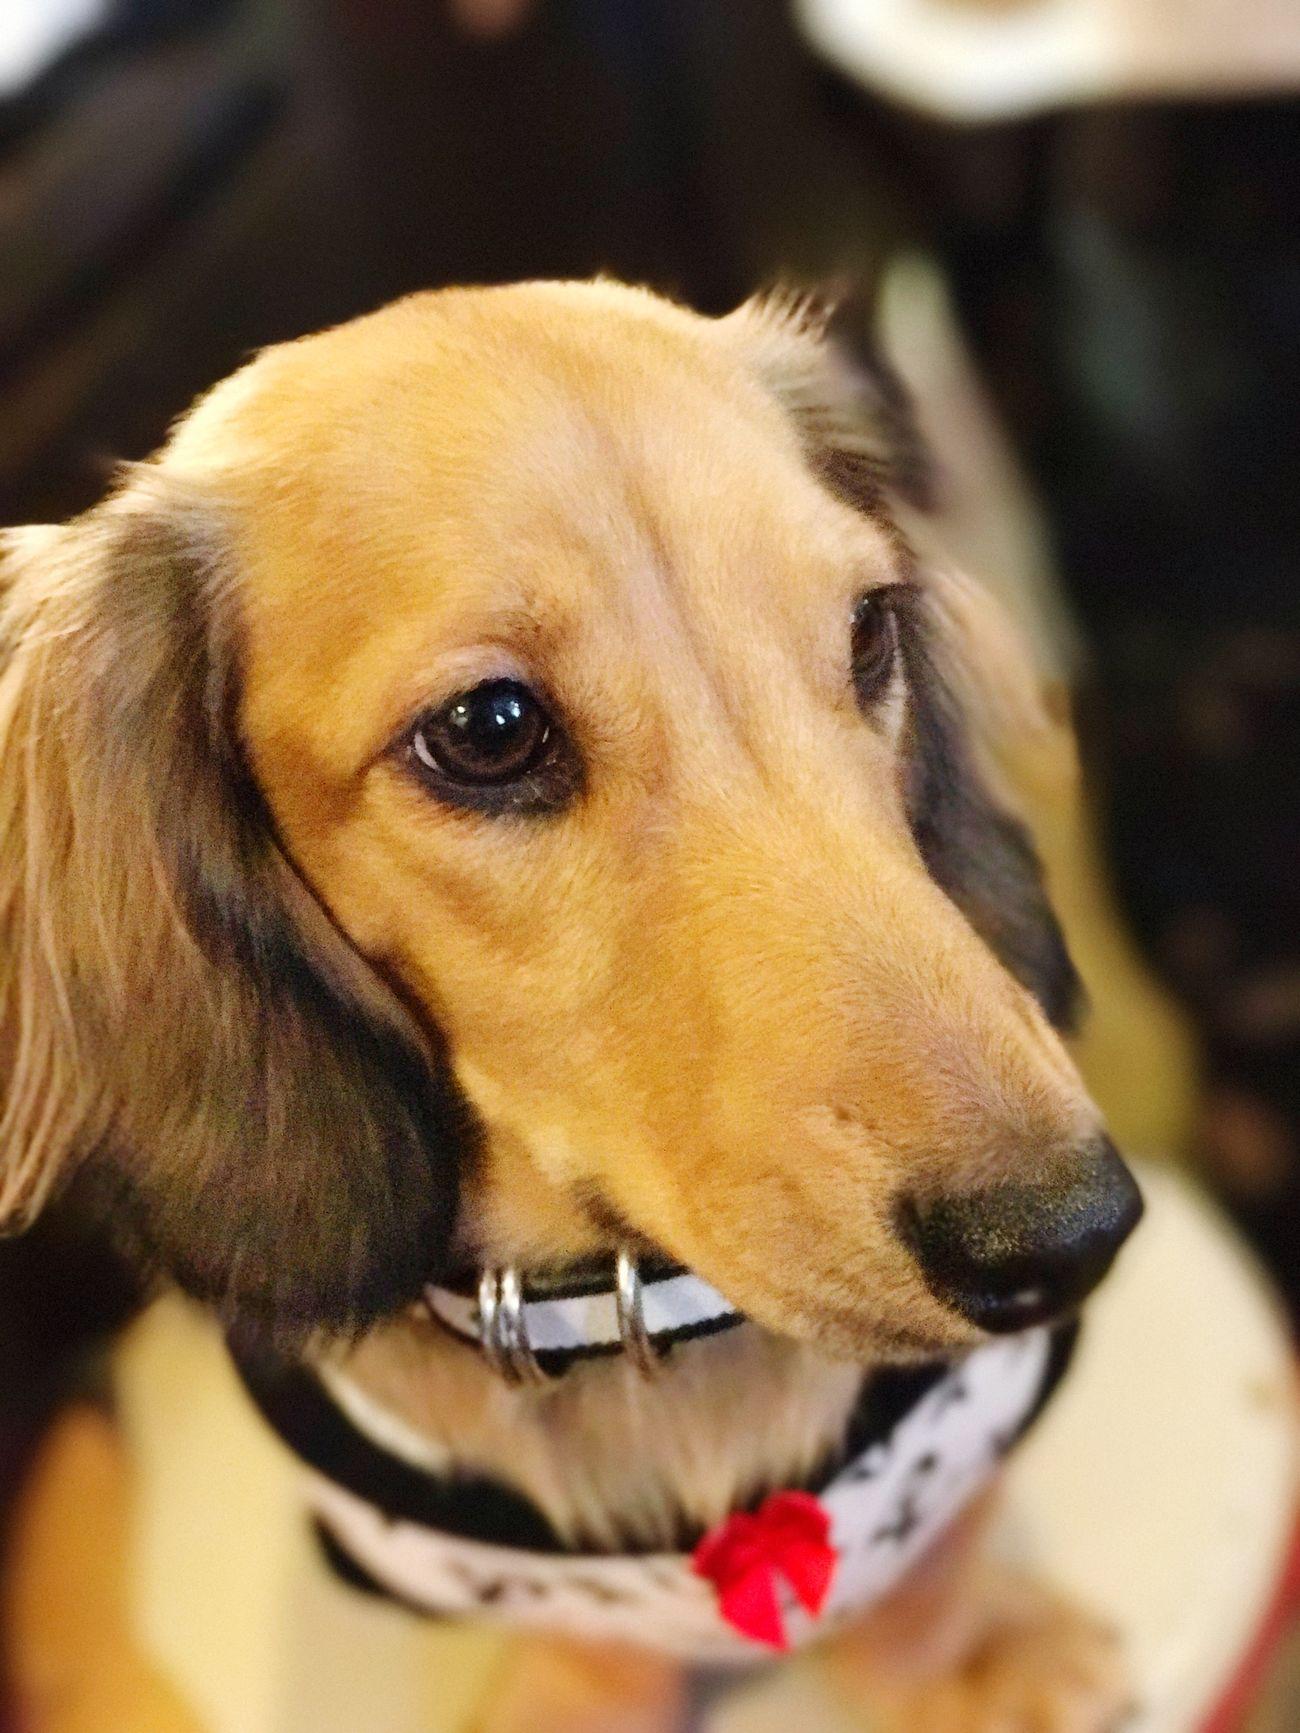 IPhone7Plus Dog Pets Close-up